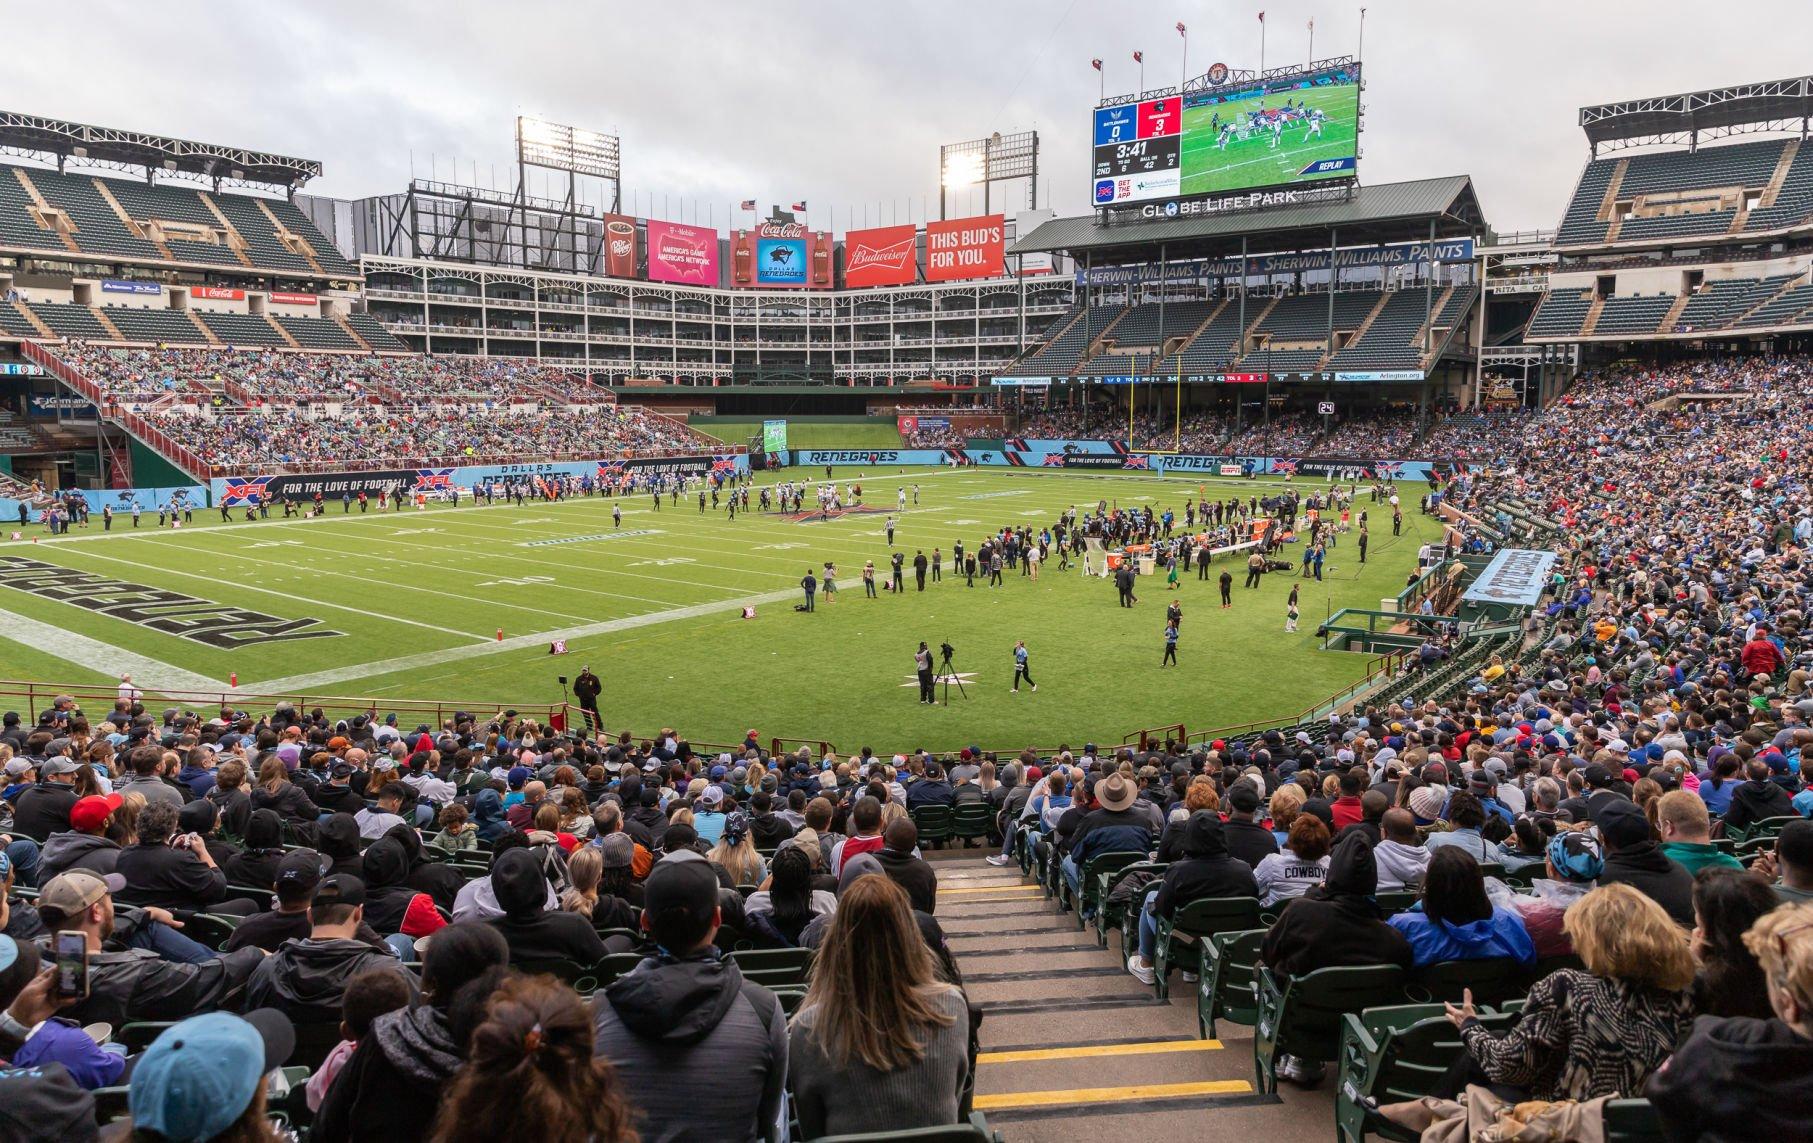 Globe Life Park becomes a football stadium as the XFL comes to Arlington